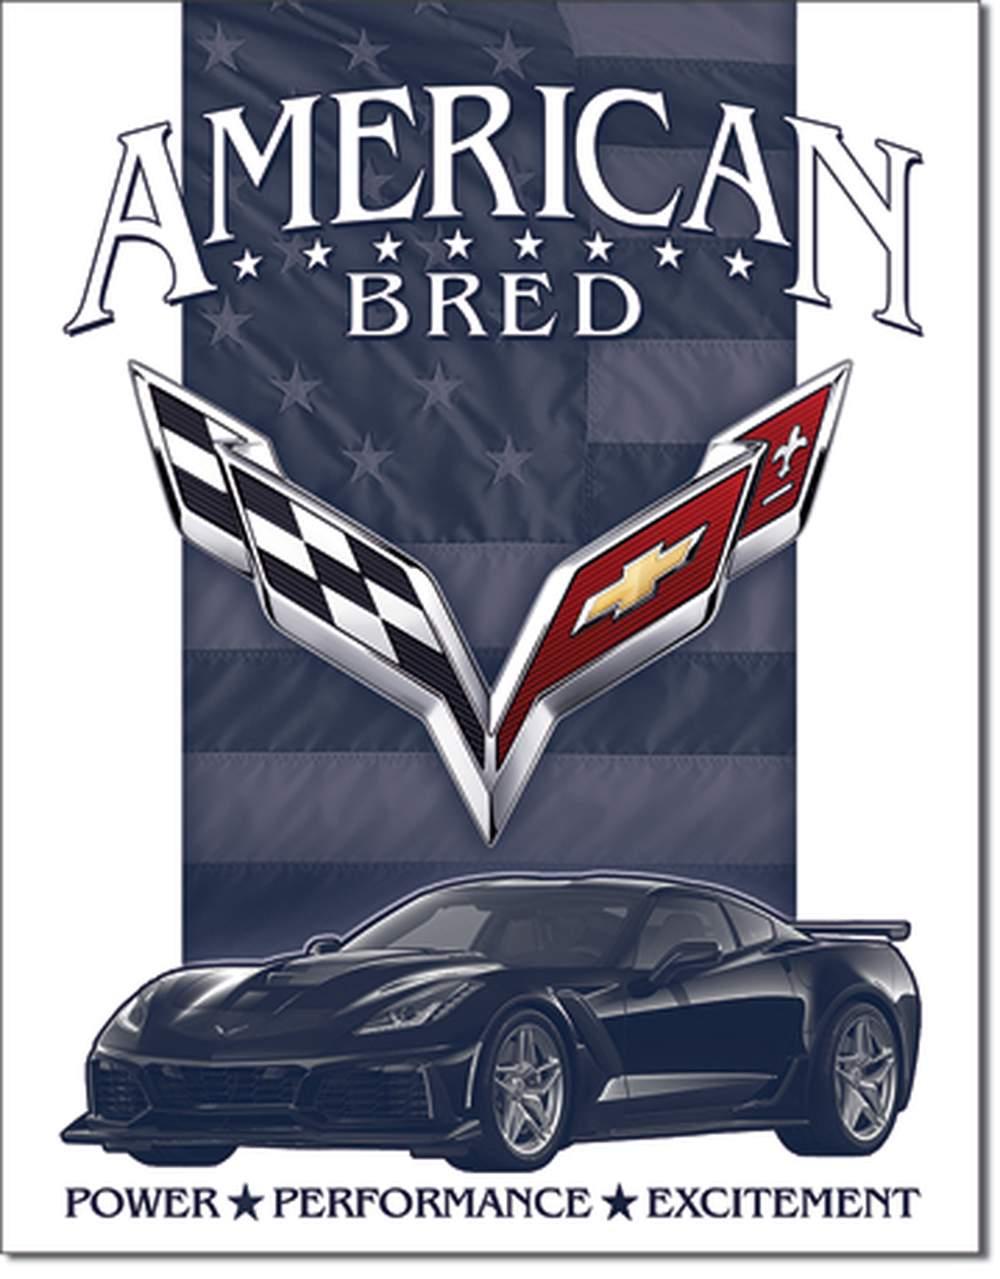 Tin Sign - Corvette - American Bred